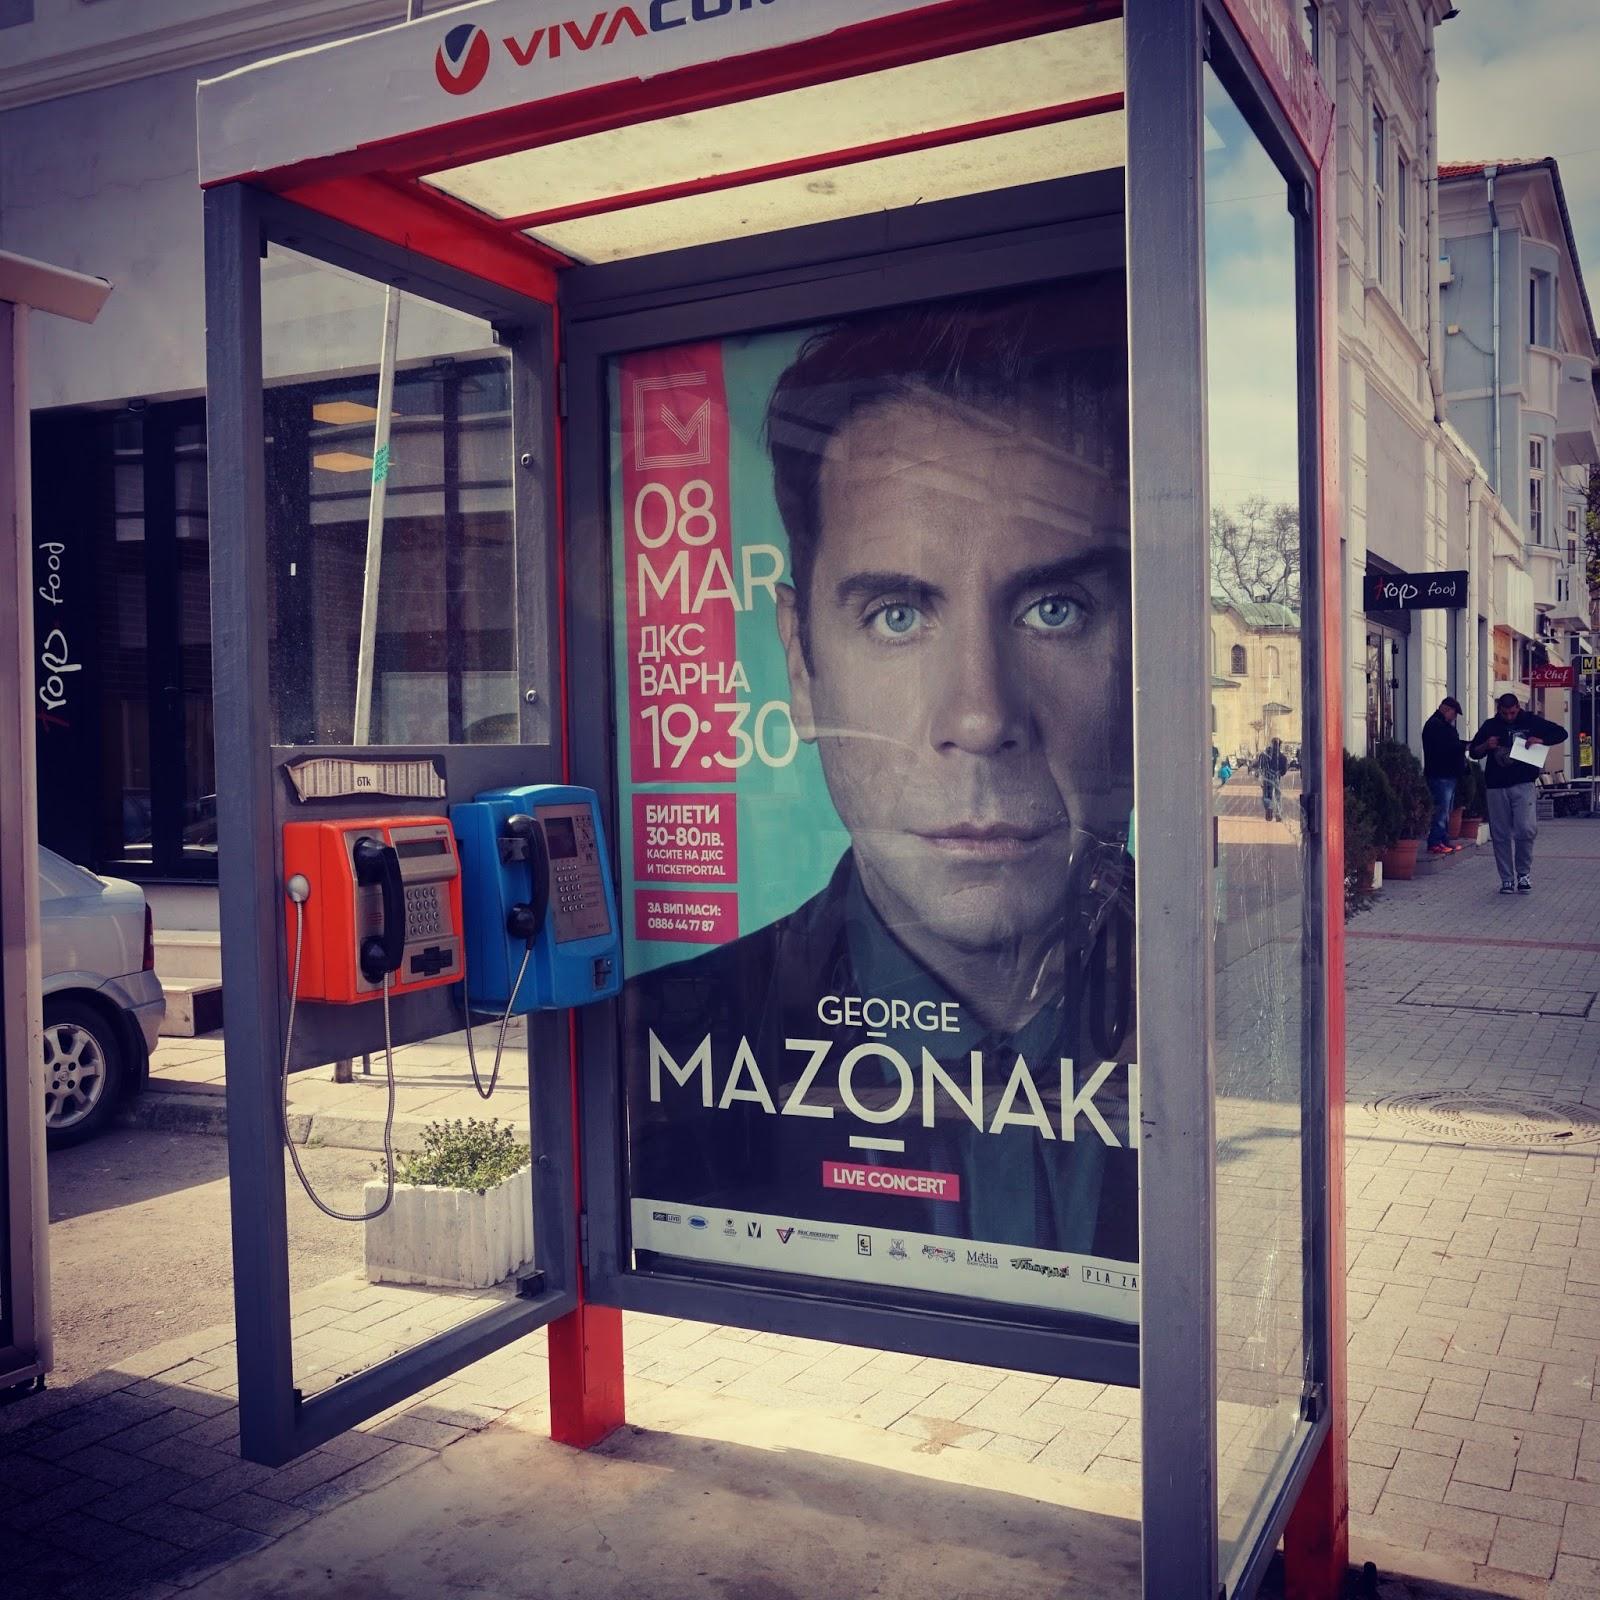 c06c02517ab7 Τι είδαν τα ματάκια μου στη Βουλγαρία...»